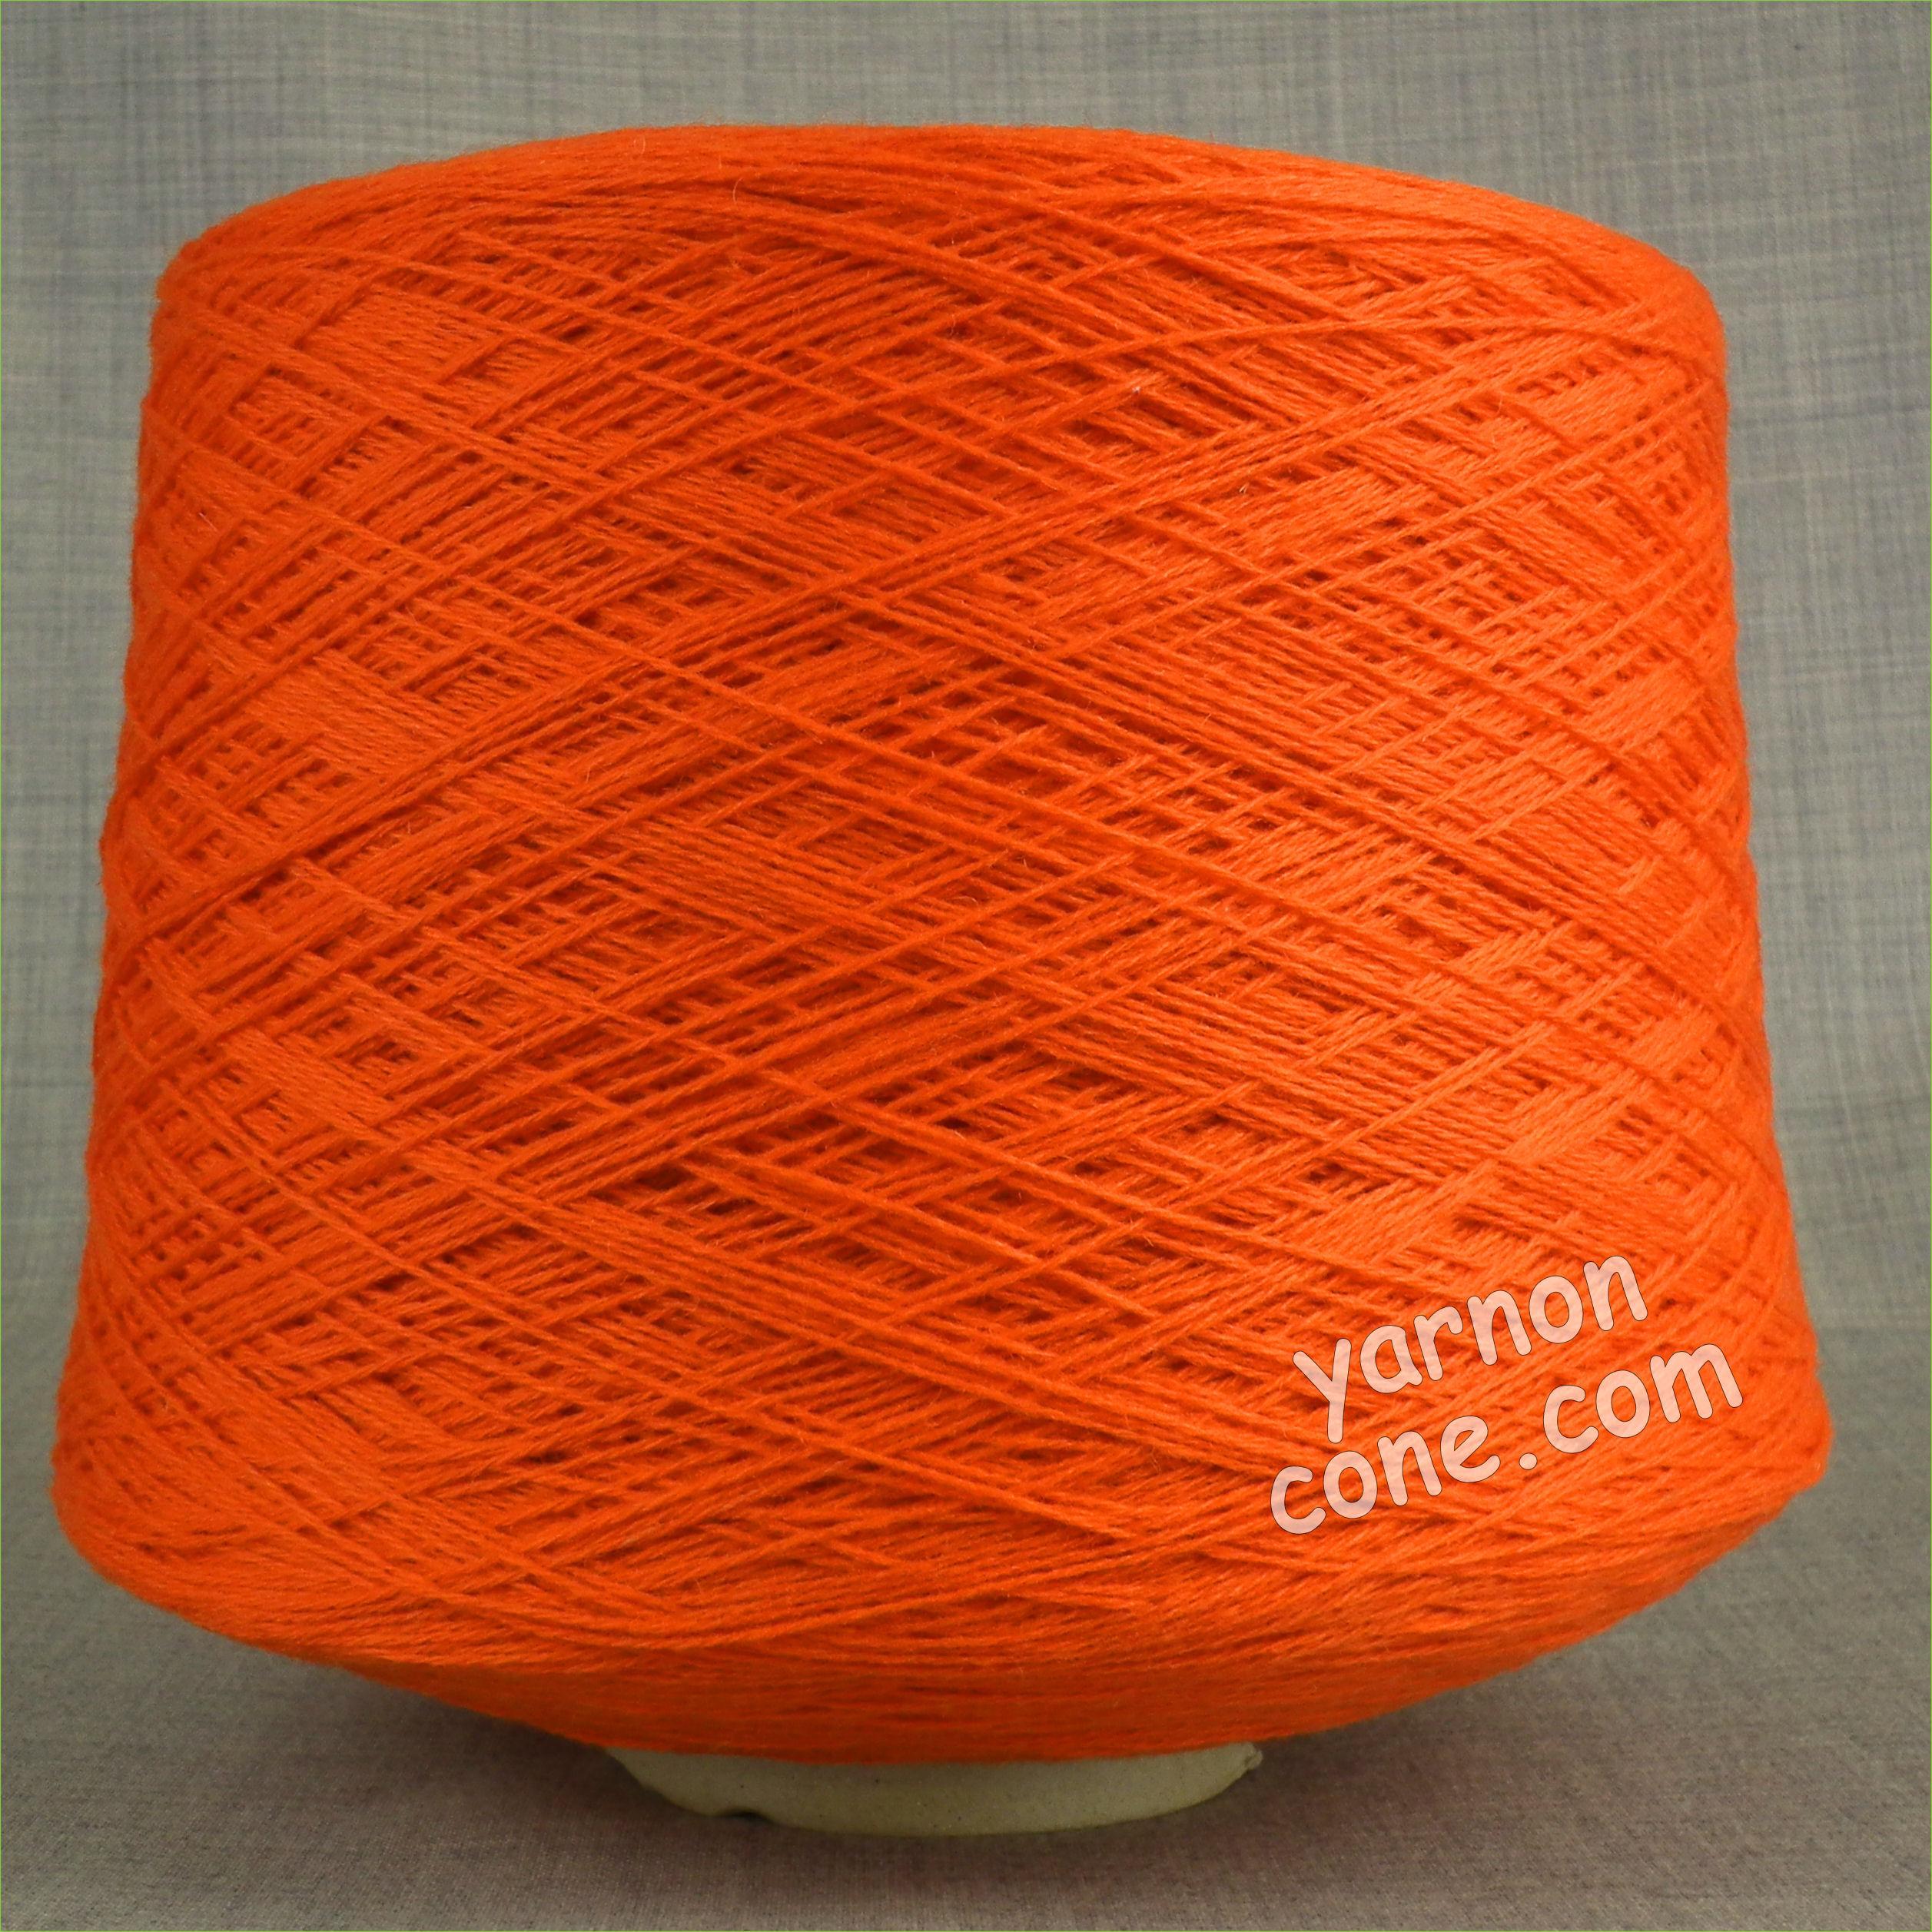 natural fantasy extrageelong geelong merino wool pure italian salmone orange 3 4 ply knitting yarn on cone